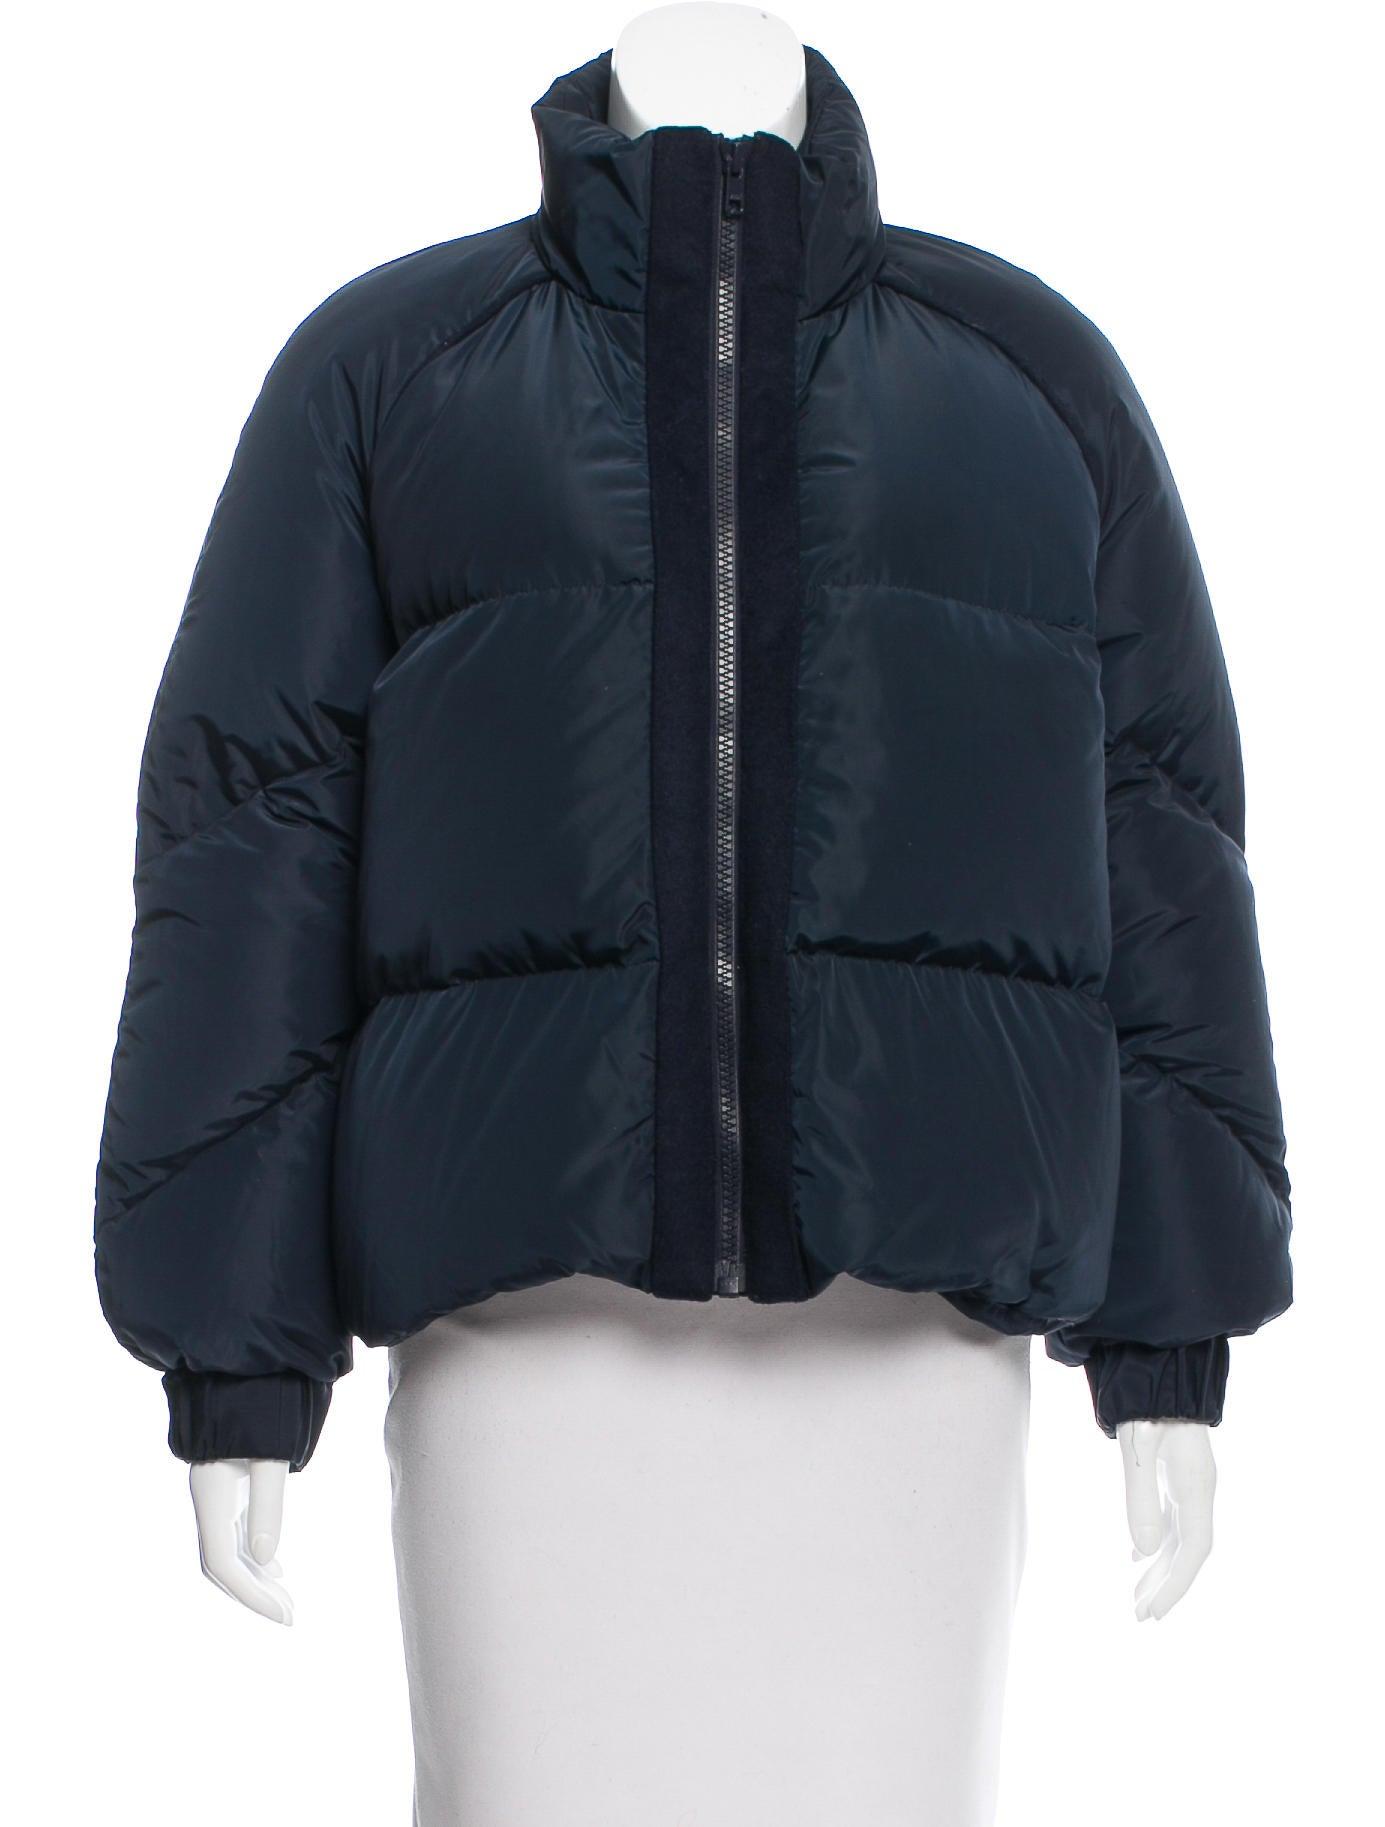 16fb492fb7a13 Ganni Fountain Puffer Jacket - Clothing - WZG20525 | The RealReal